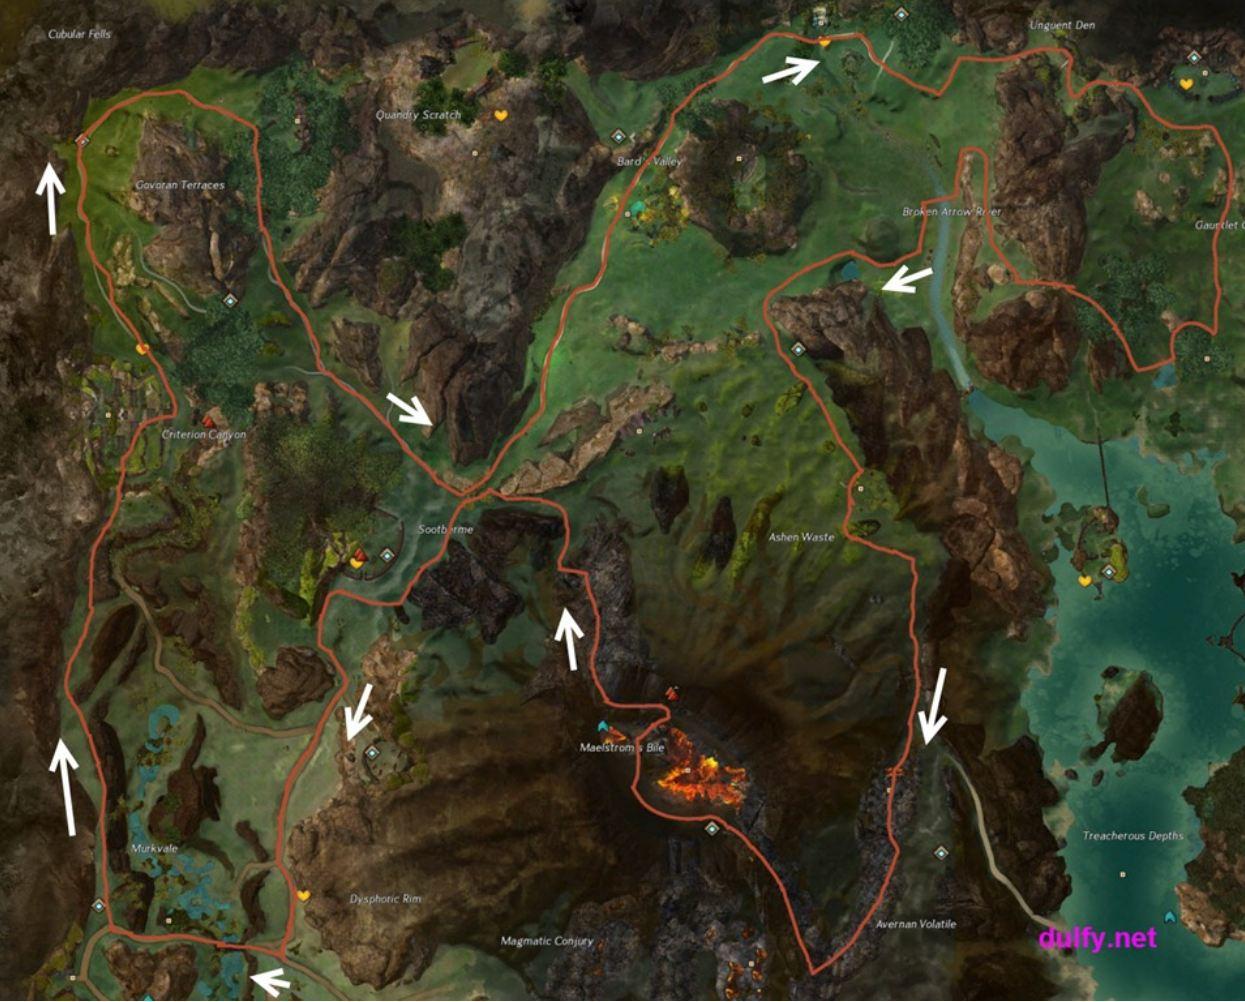 gw2-half-baked-komali-map.jpg